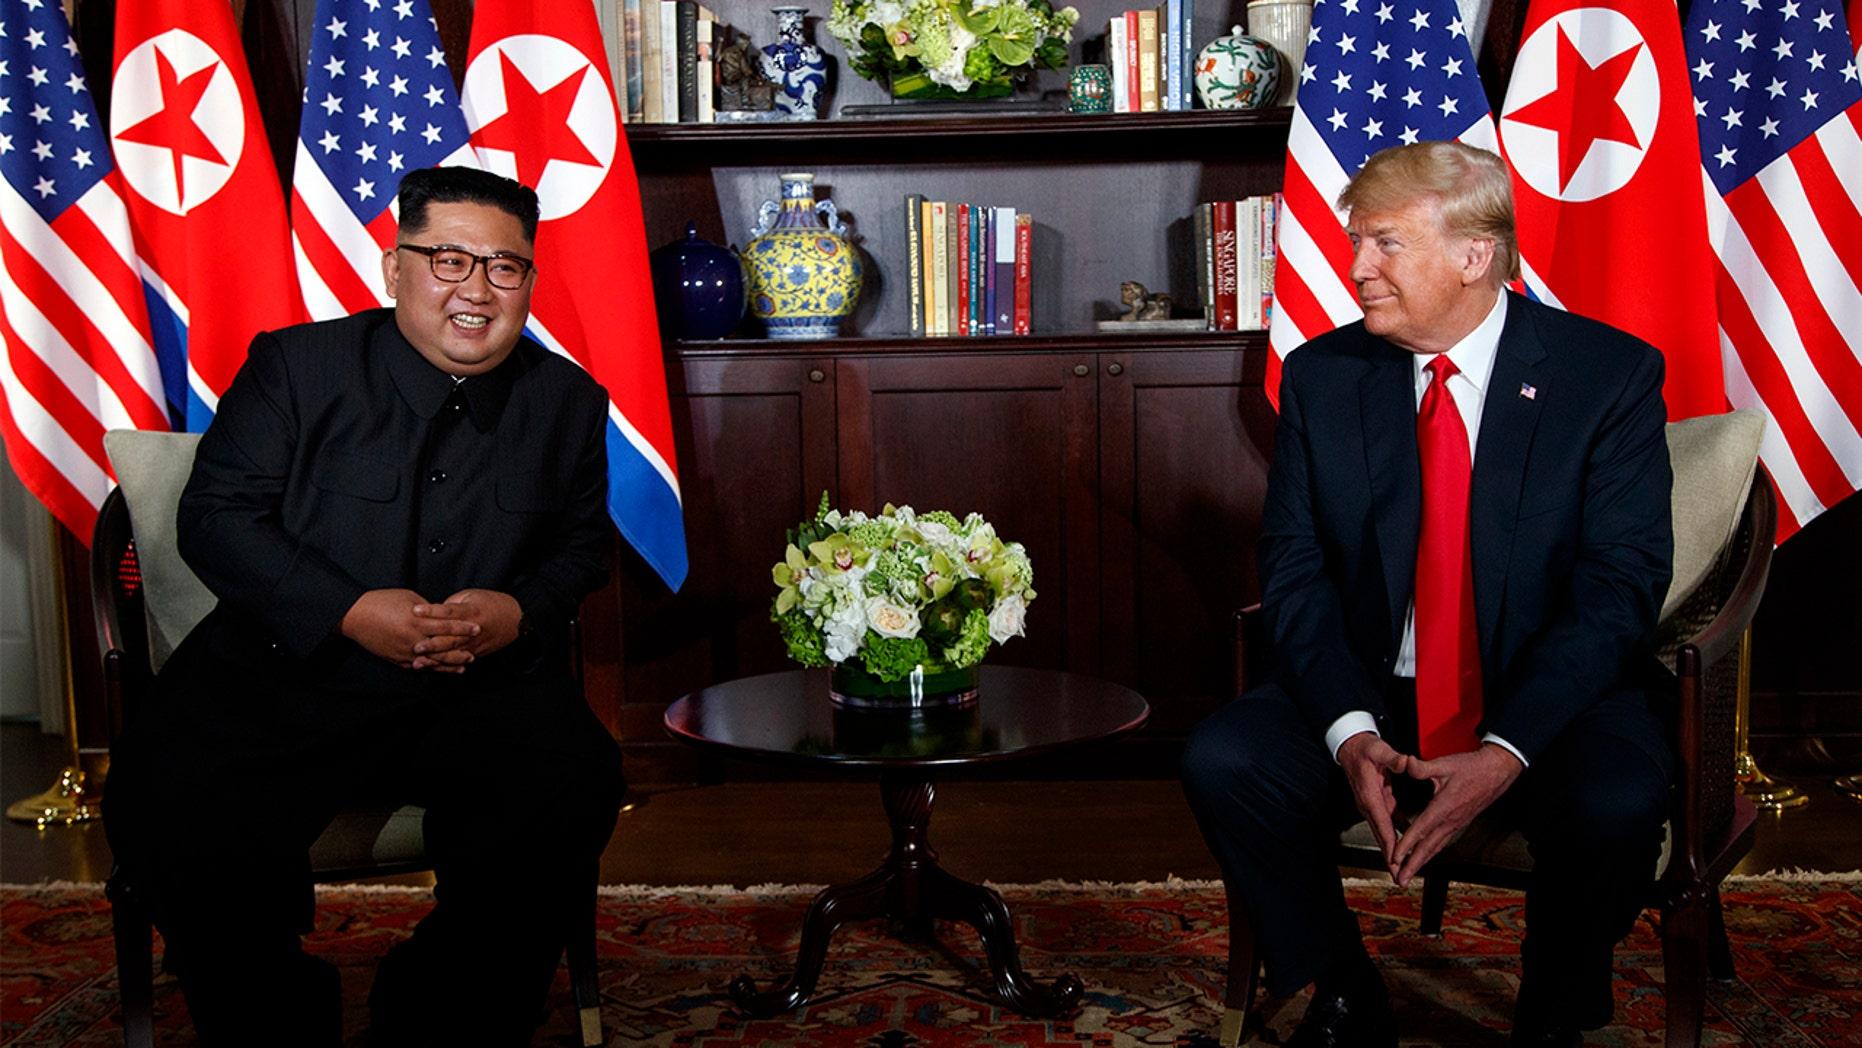 President Donald Trump meets with North Korean leader Kim Jong Un on Sentosa Island, Tuesday, June 12, 2018, in Singapore.